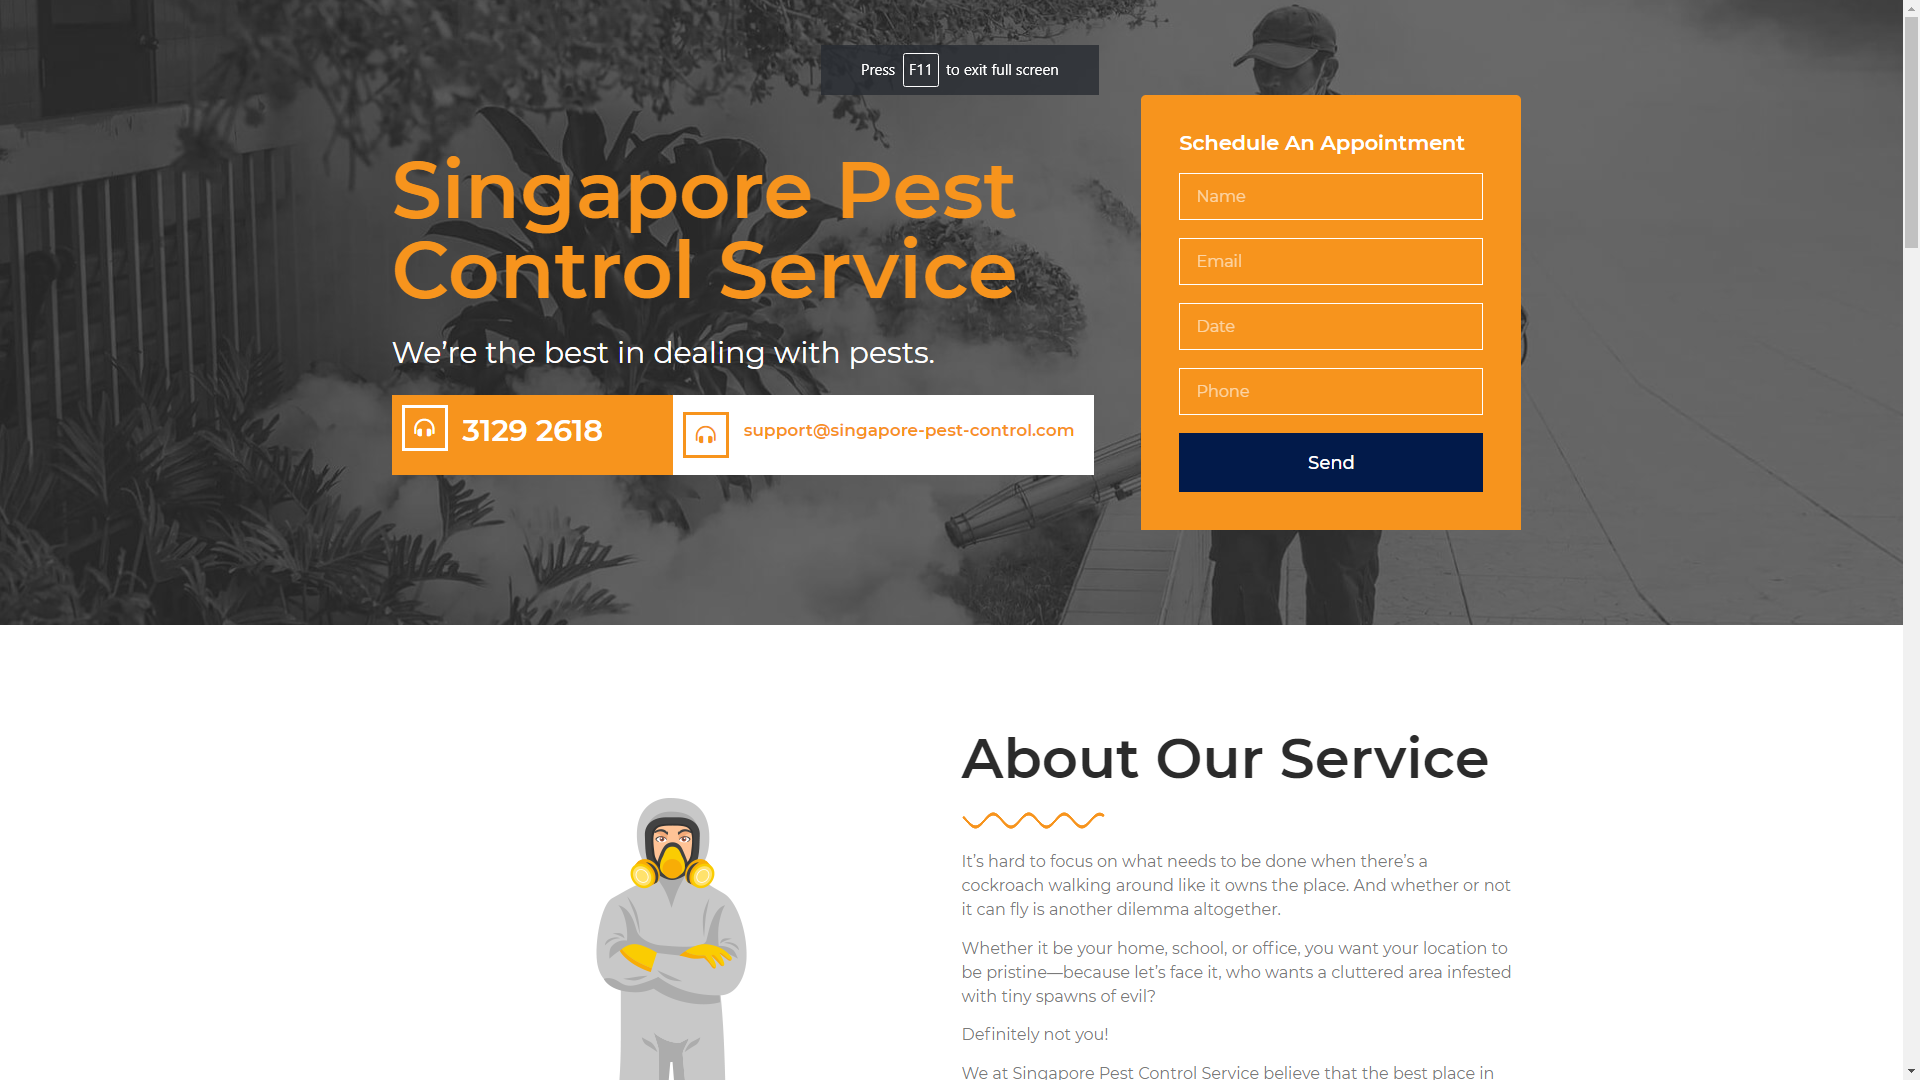 Singapore Pest Control Service pest control companies in Singapore